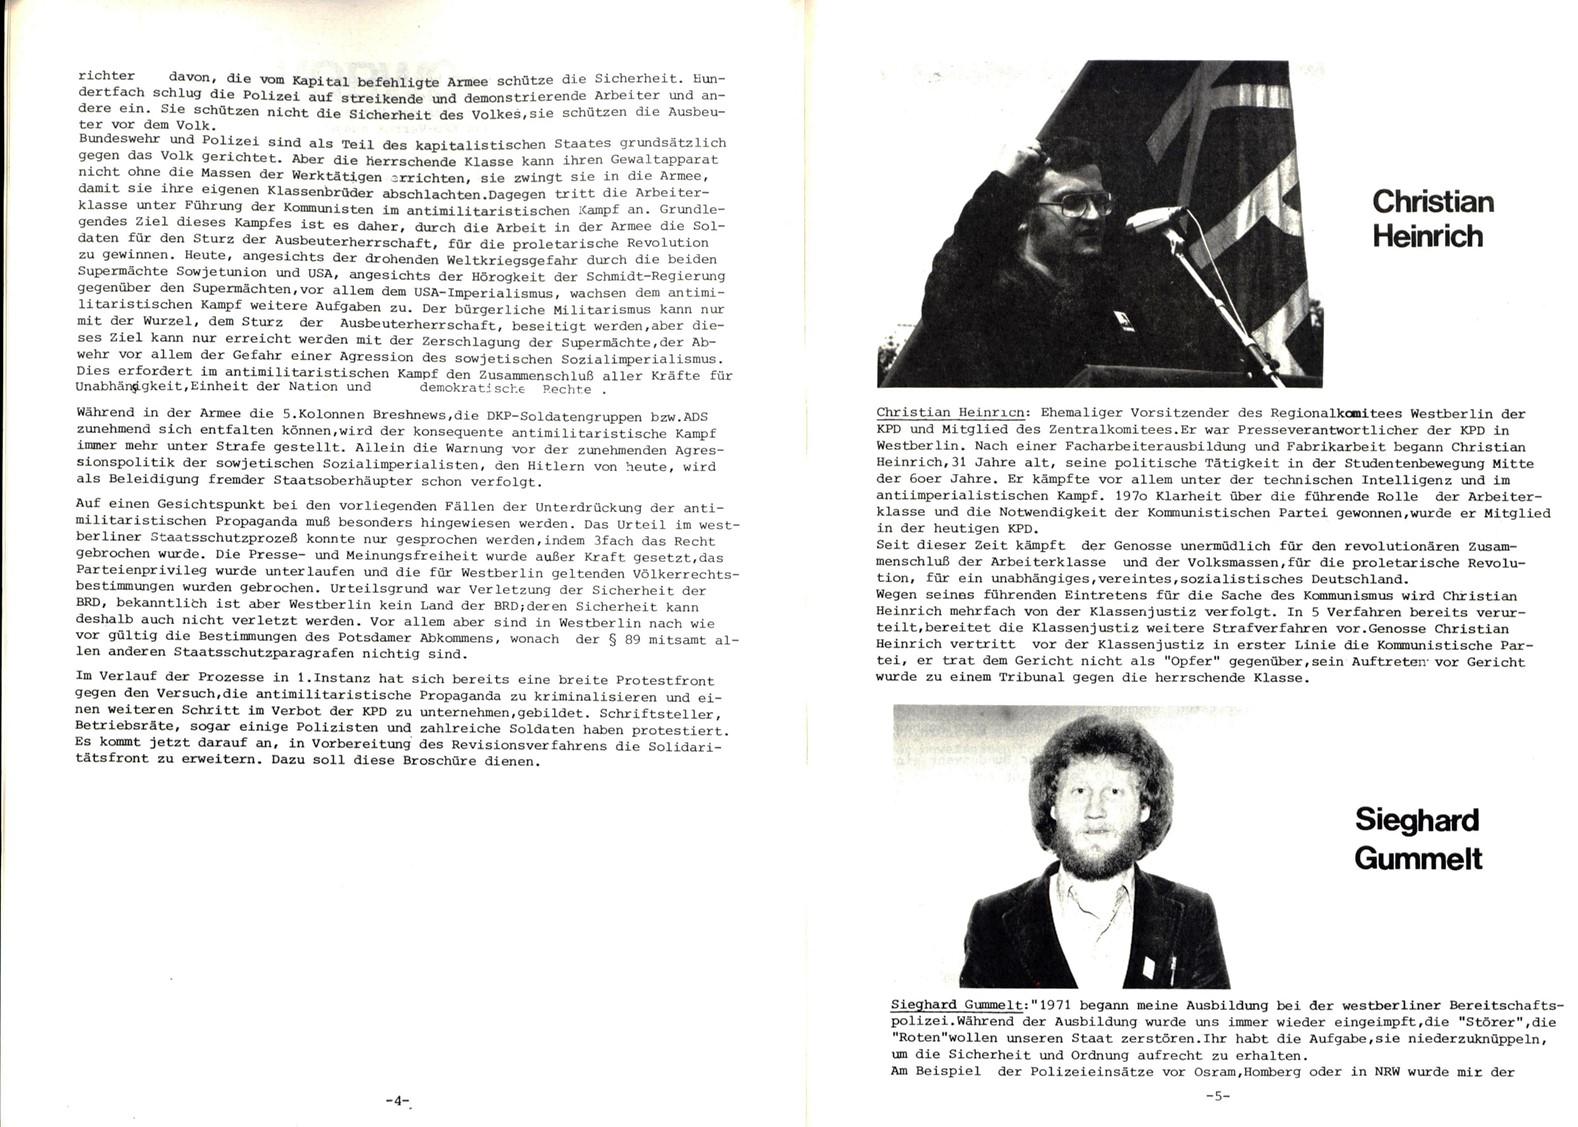 KPDAO_1976_Staatsschutzparagrafen_03